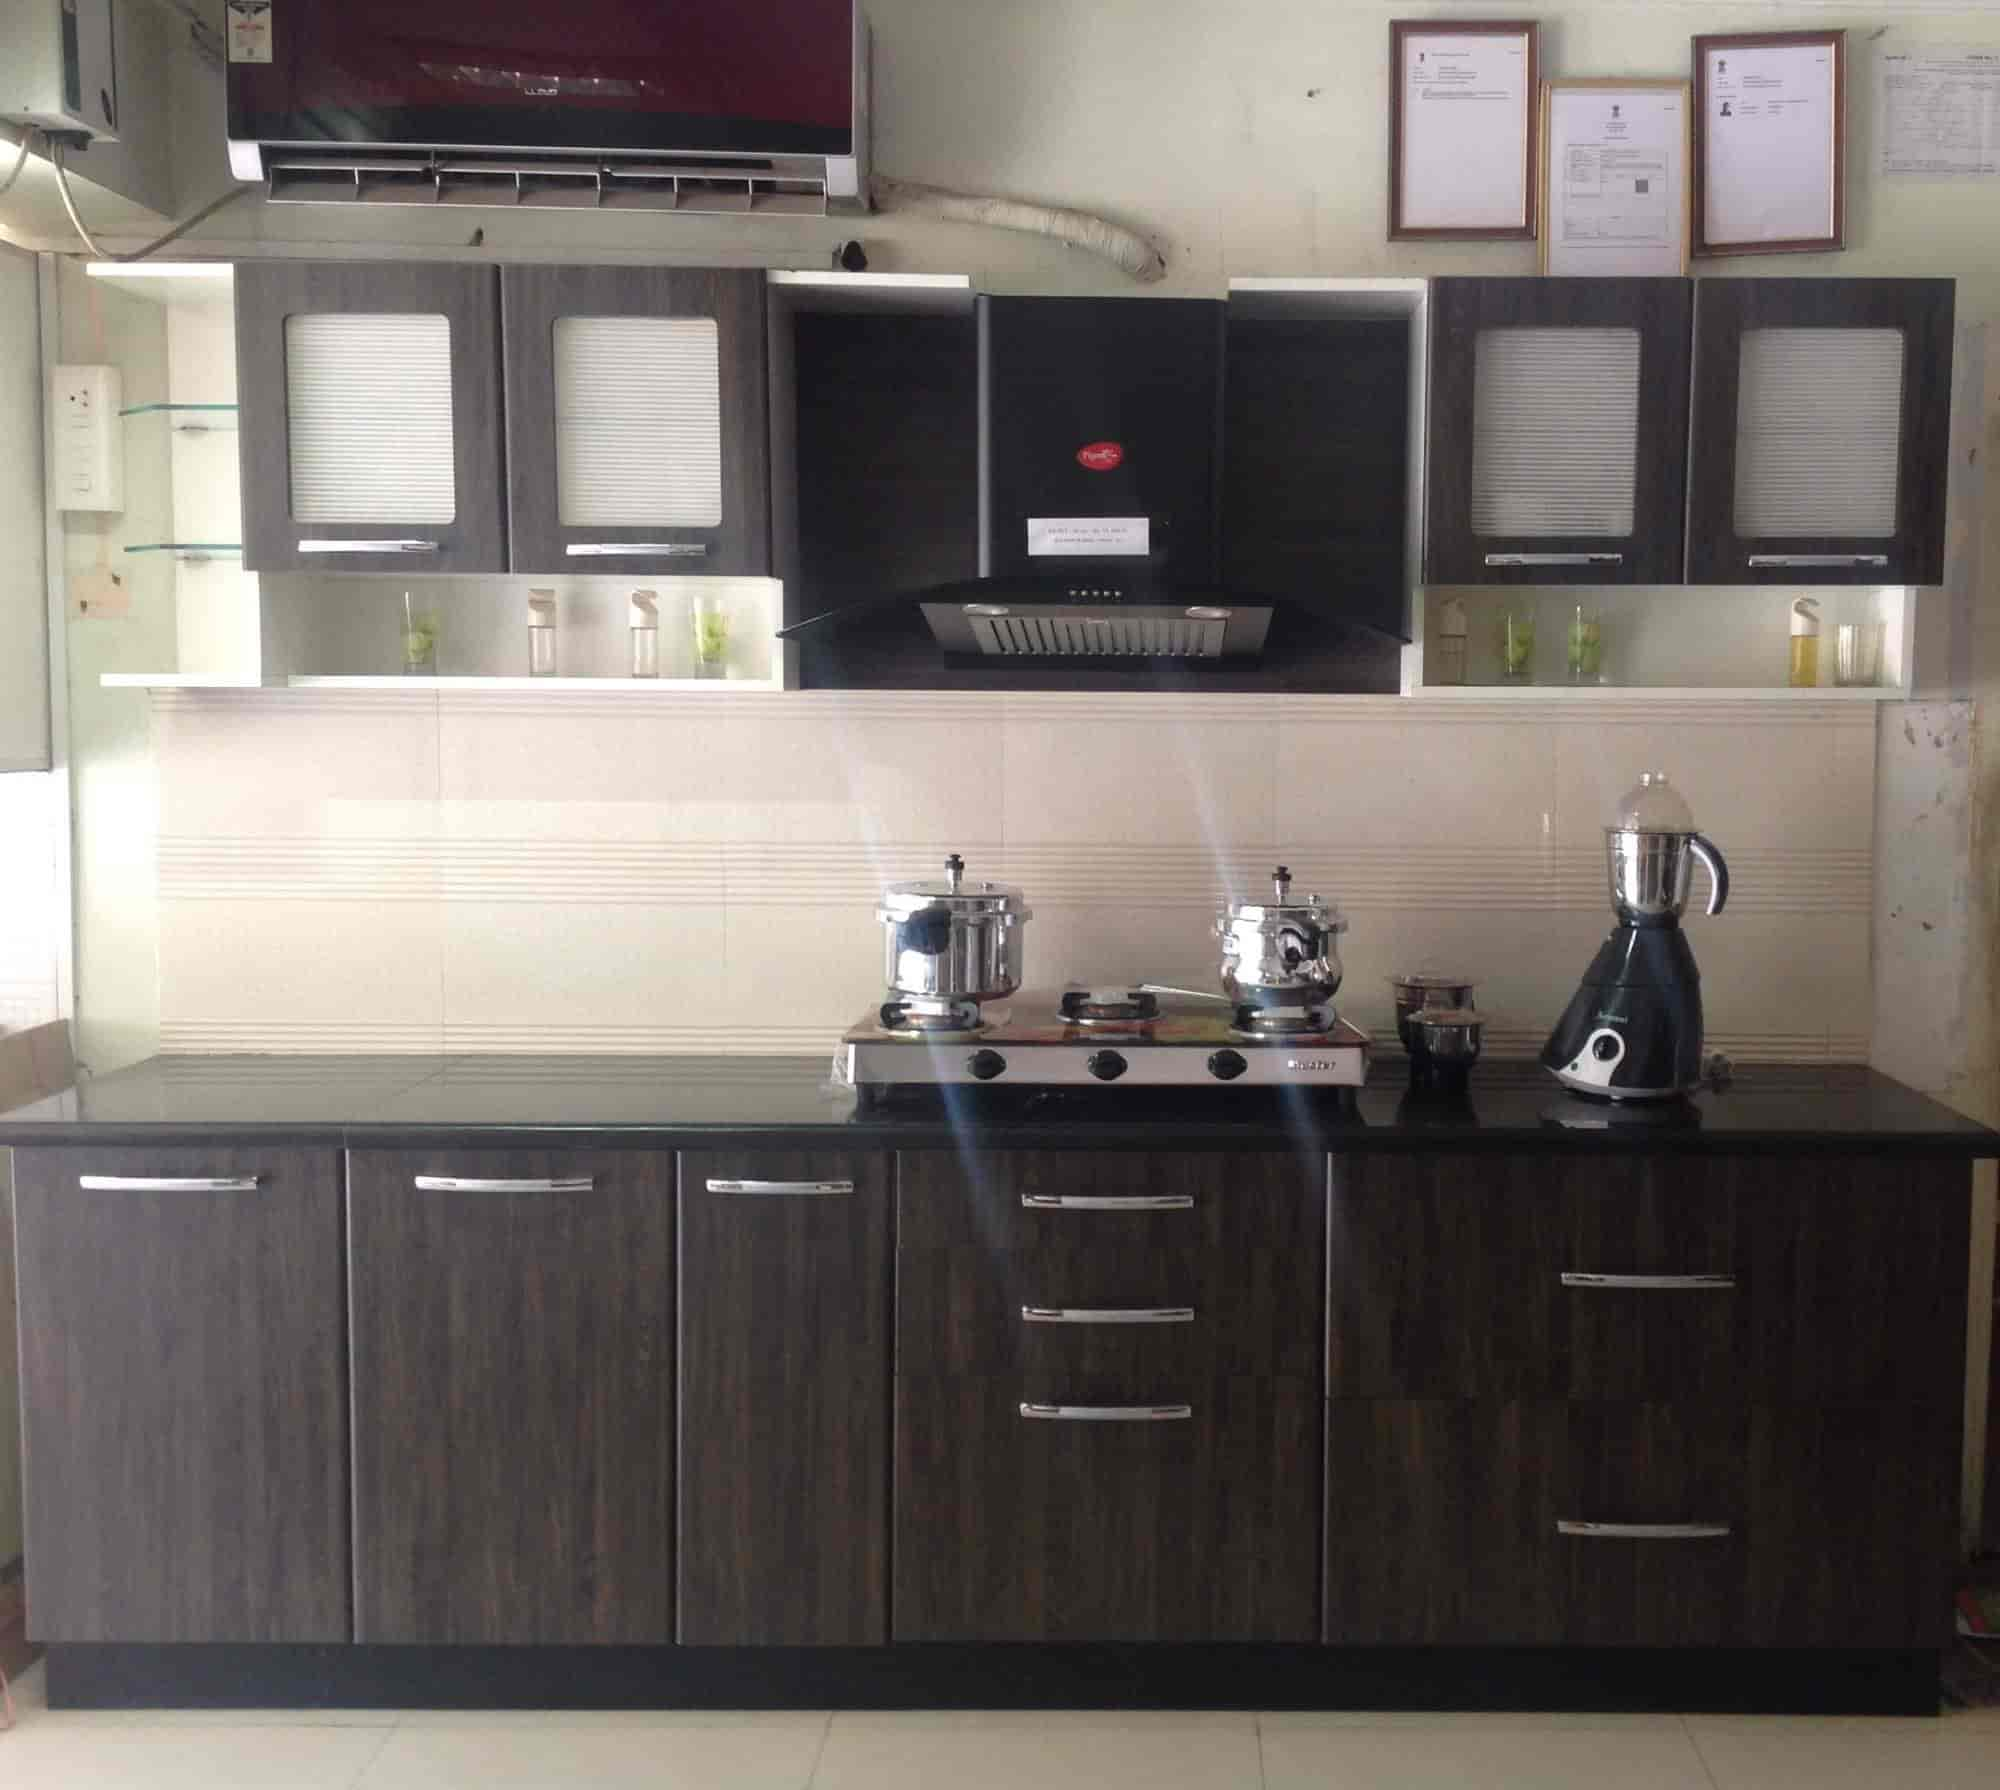 Sumangali Kitchen Interiors Photos, Palanganatham, Madurai- Pictures